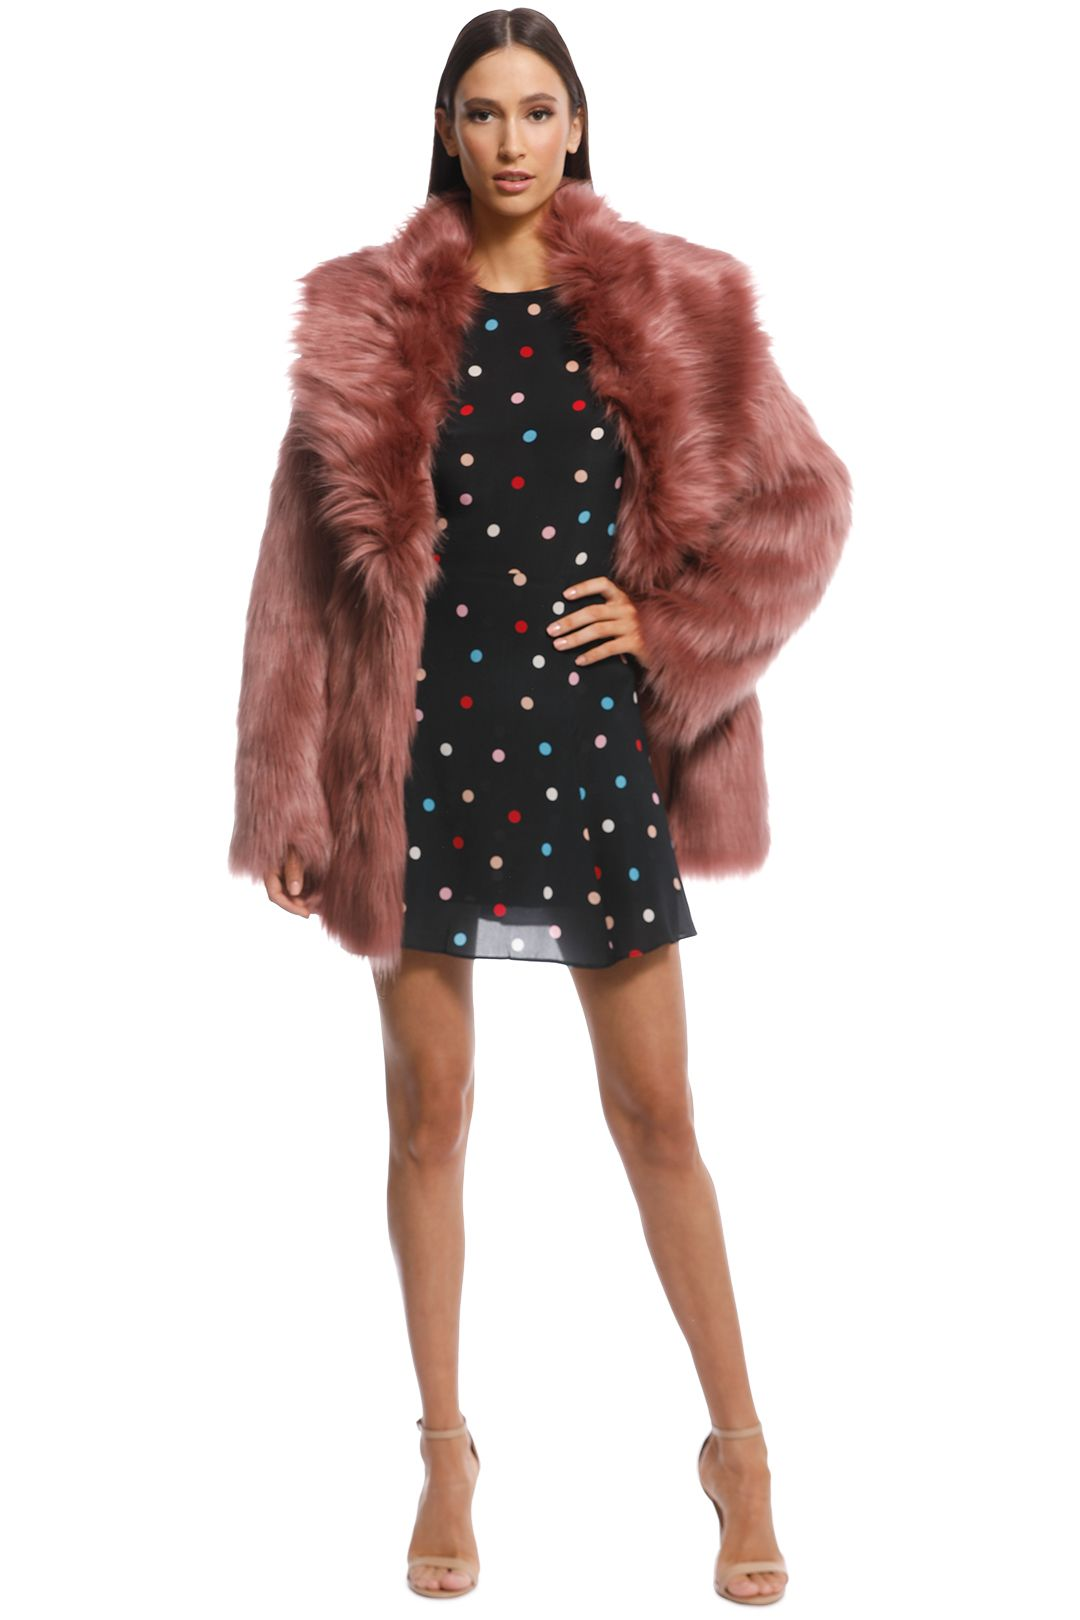 Unreal Fur - Premium Rose Jacket - Evening Rose - Front